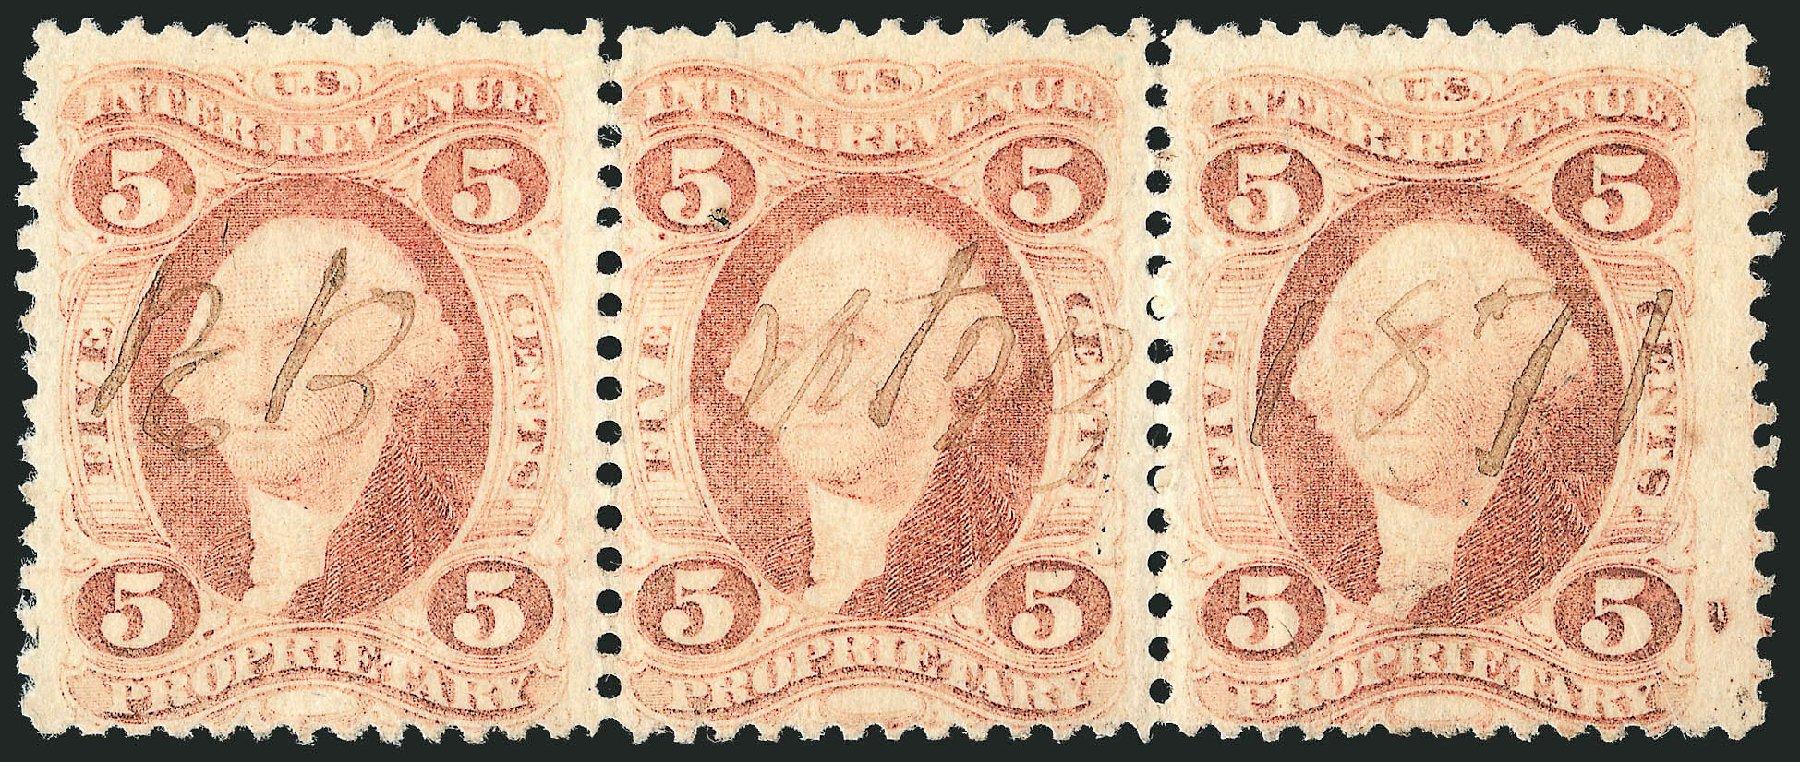 Costs of US Stamp Scott Catalogue R29: 5c 1864 Revenue Proprietary. Robert Siegel Auction Galleries, Dec 2014, Sale 1089, Lot 459